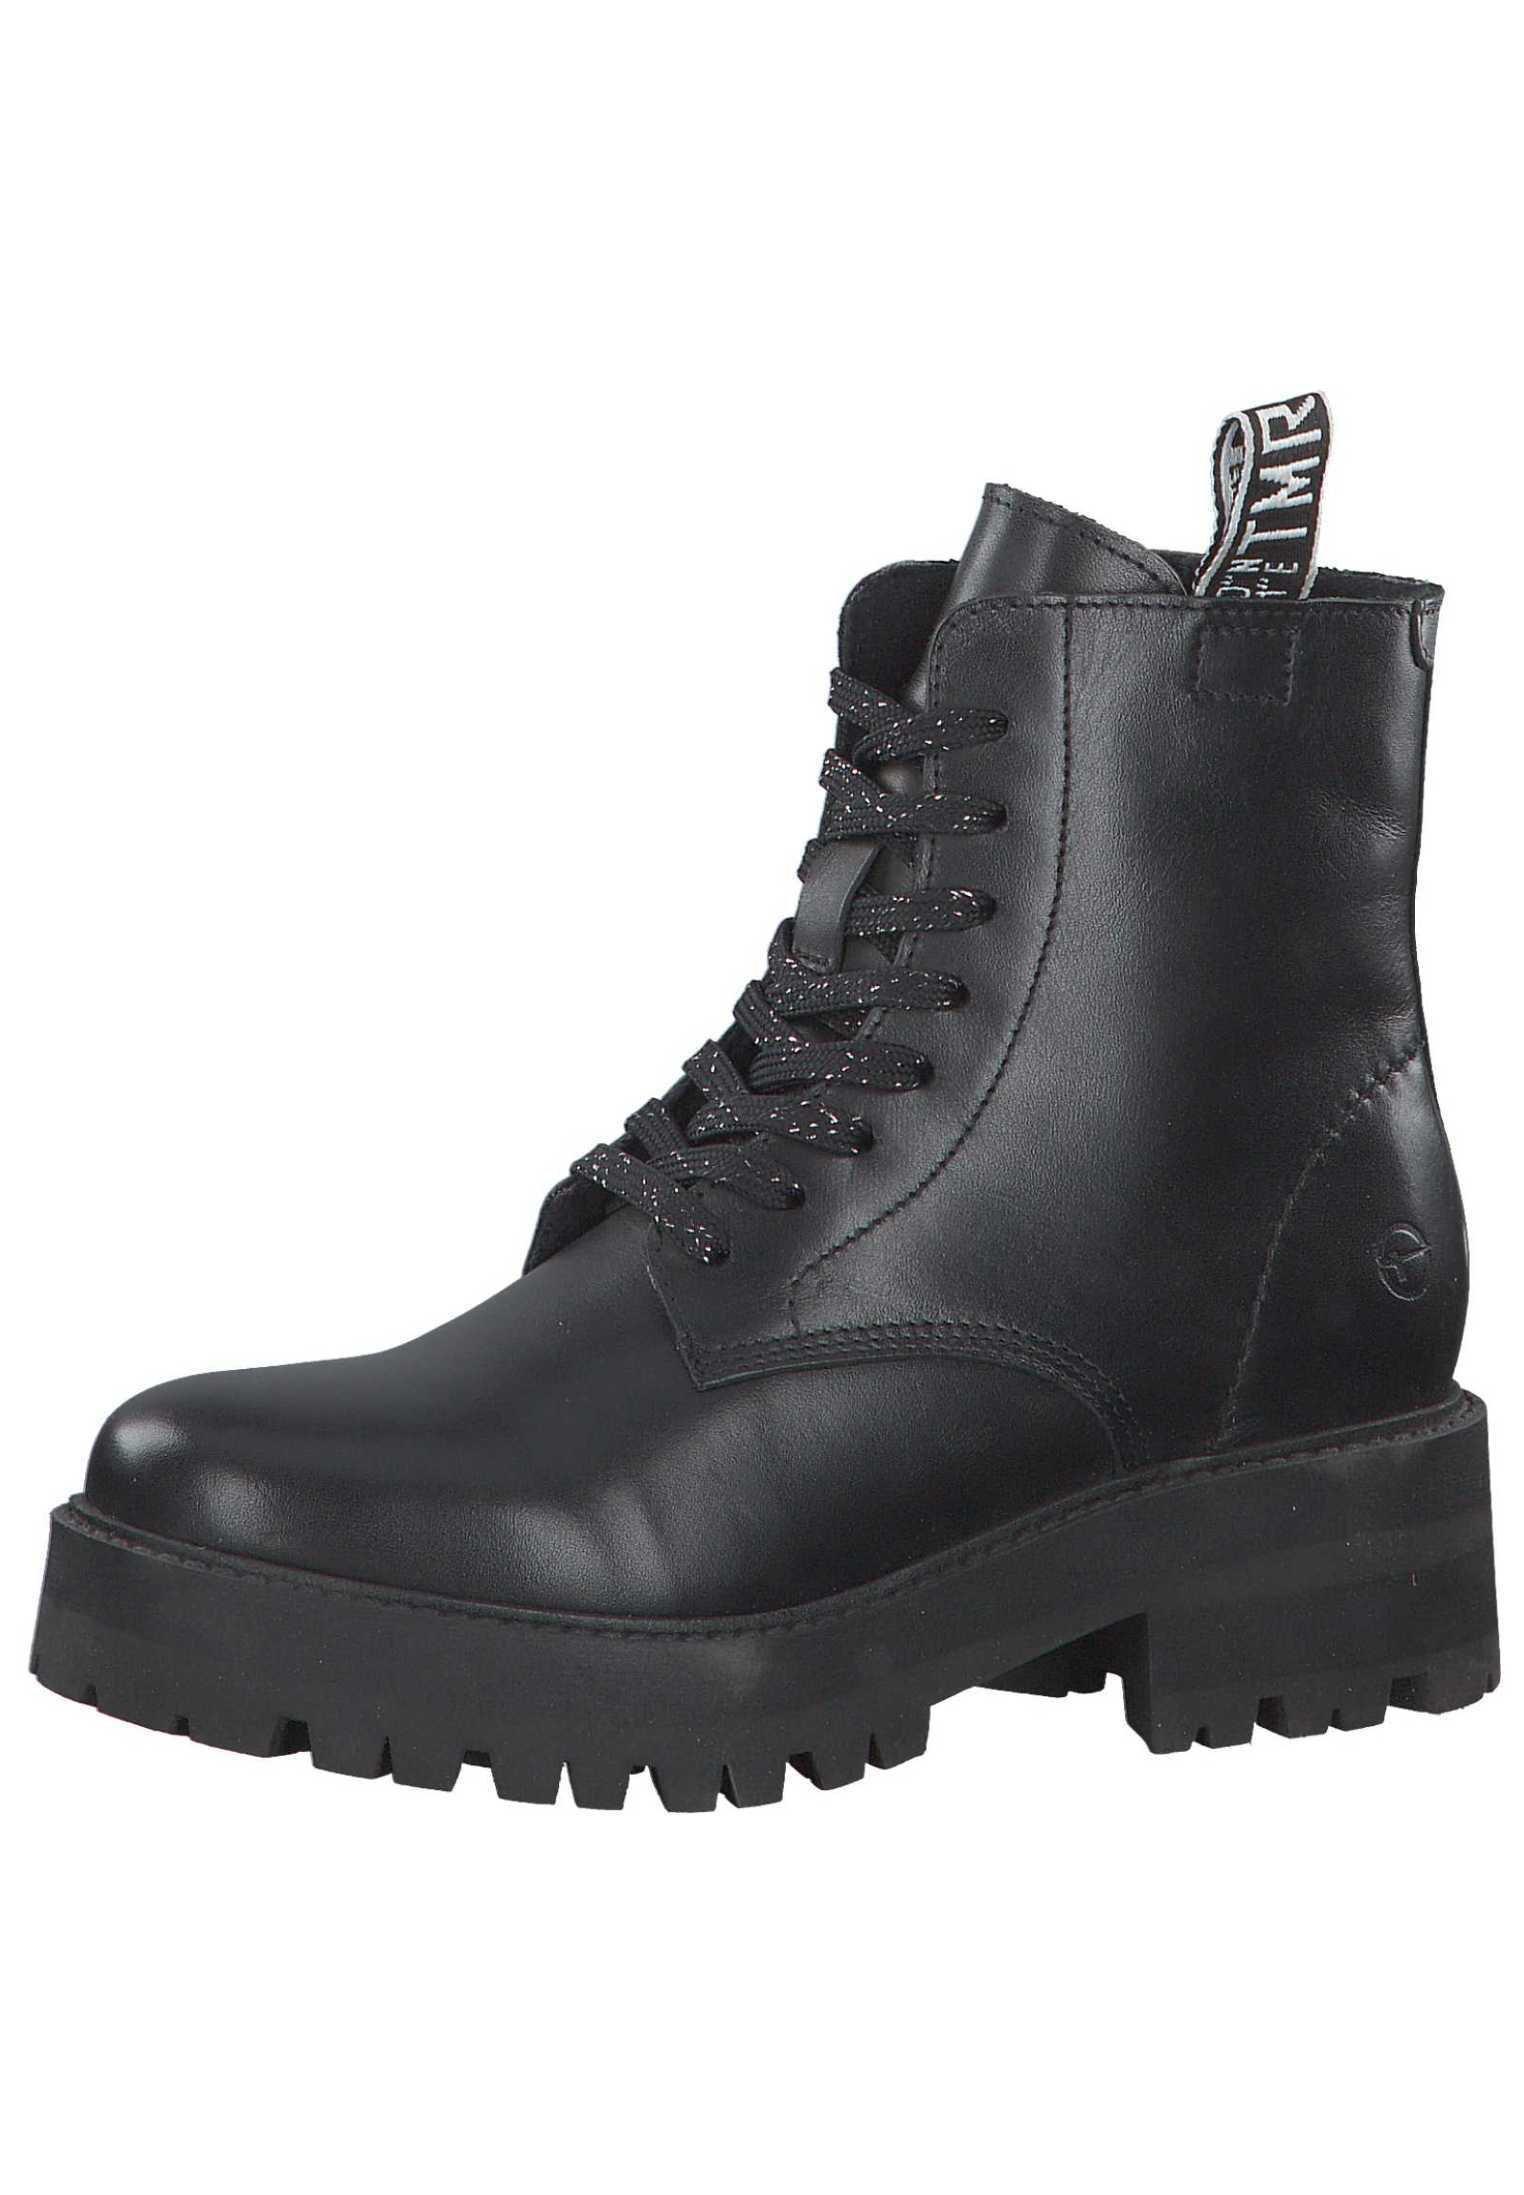 Tamaris Ankle Boot black/schwarz